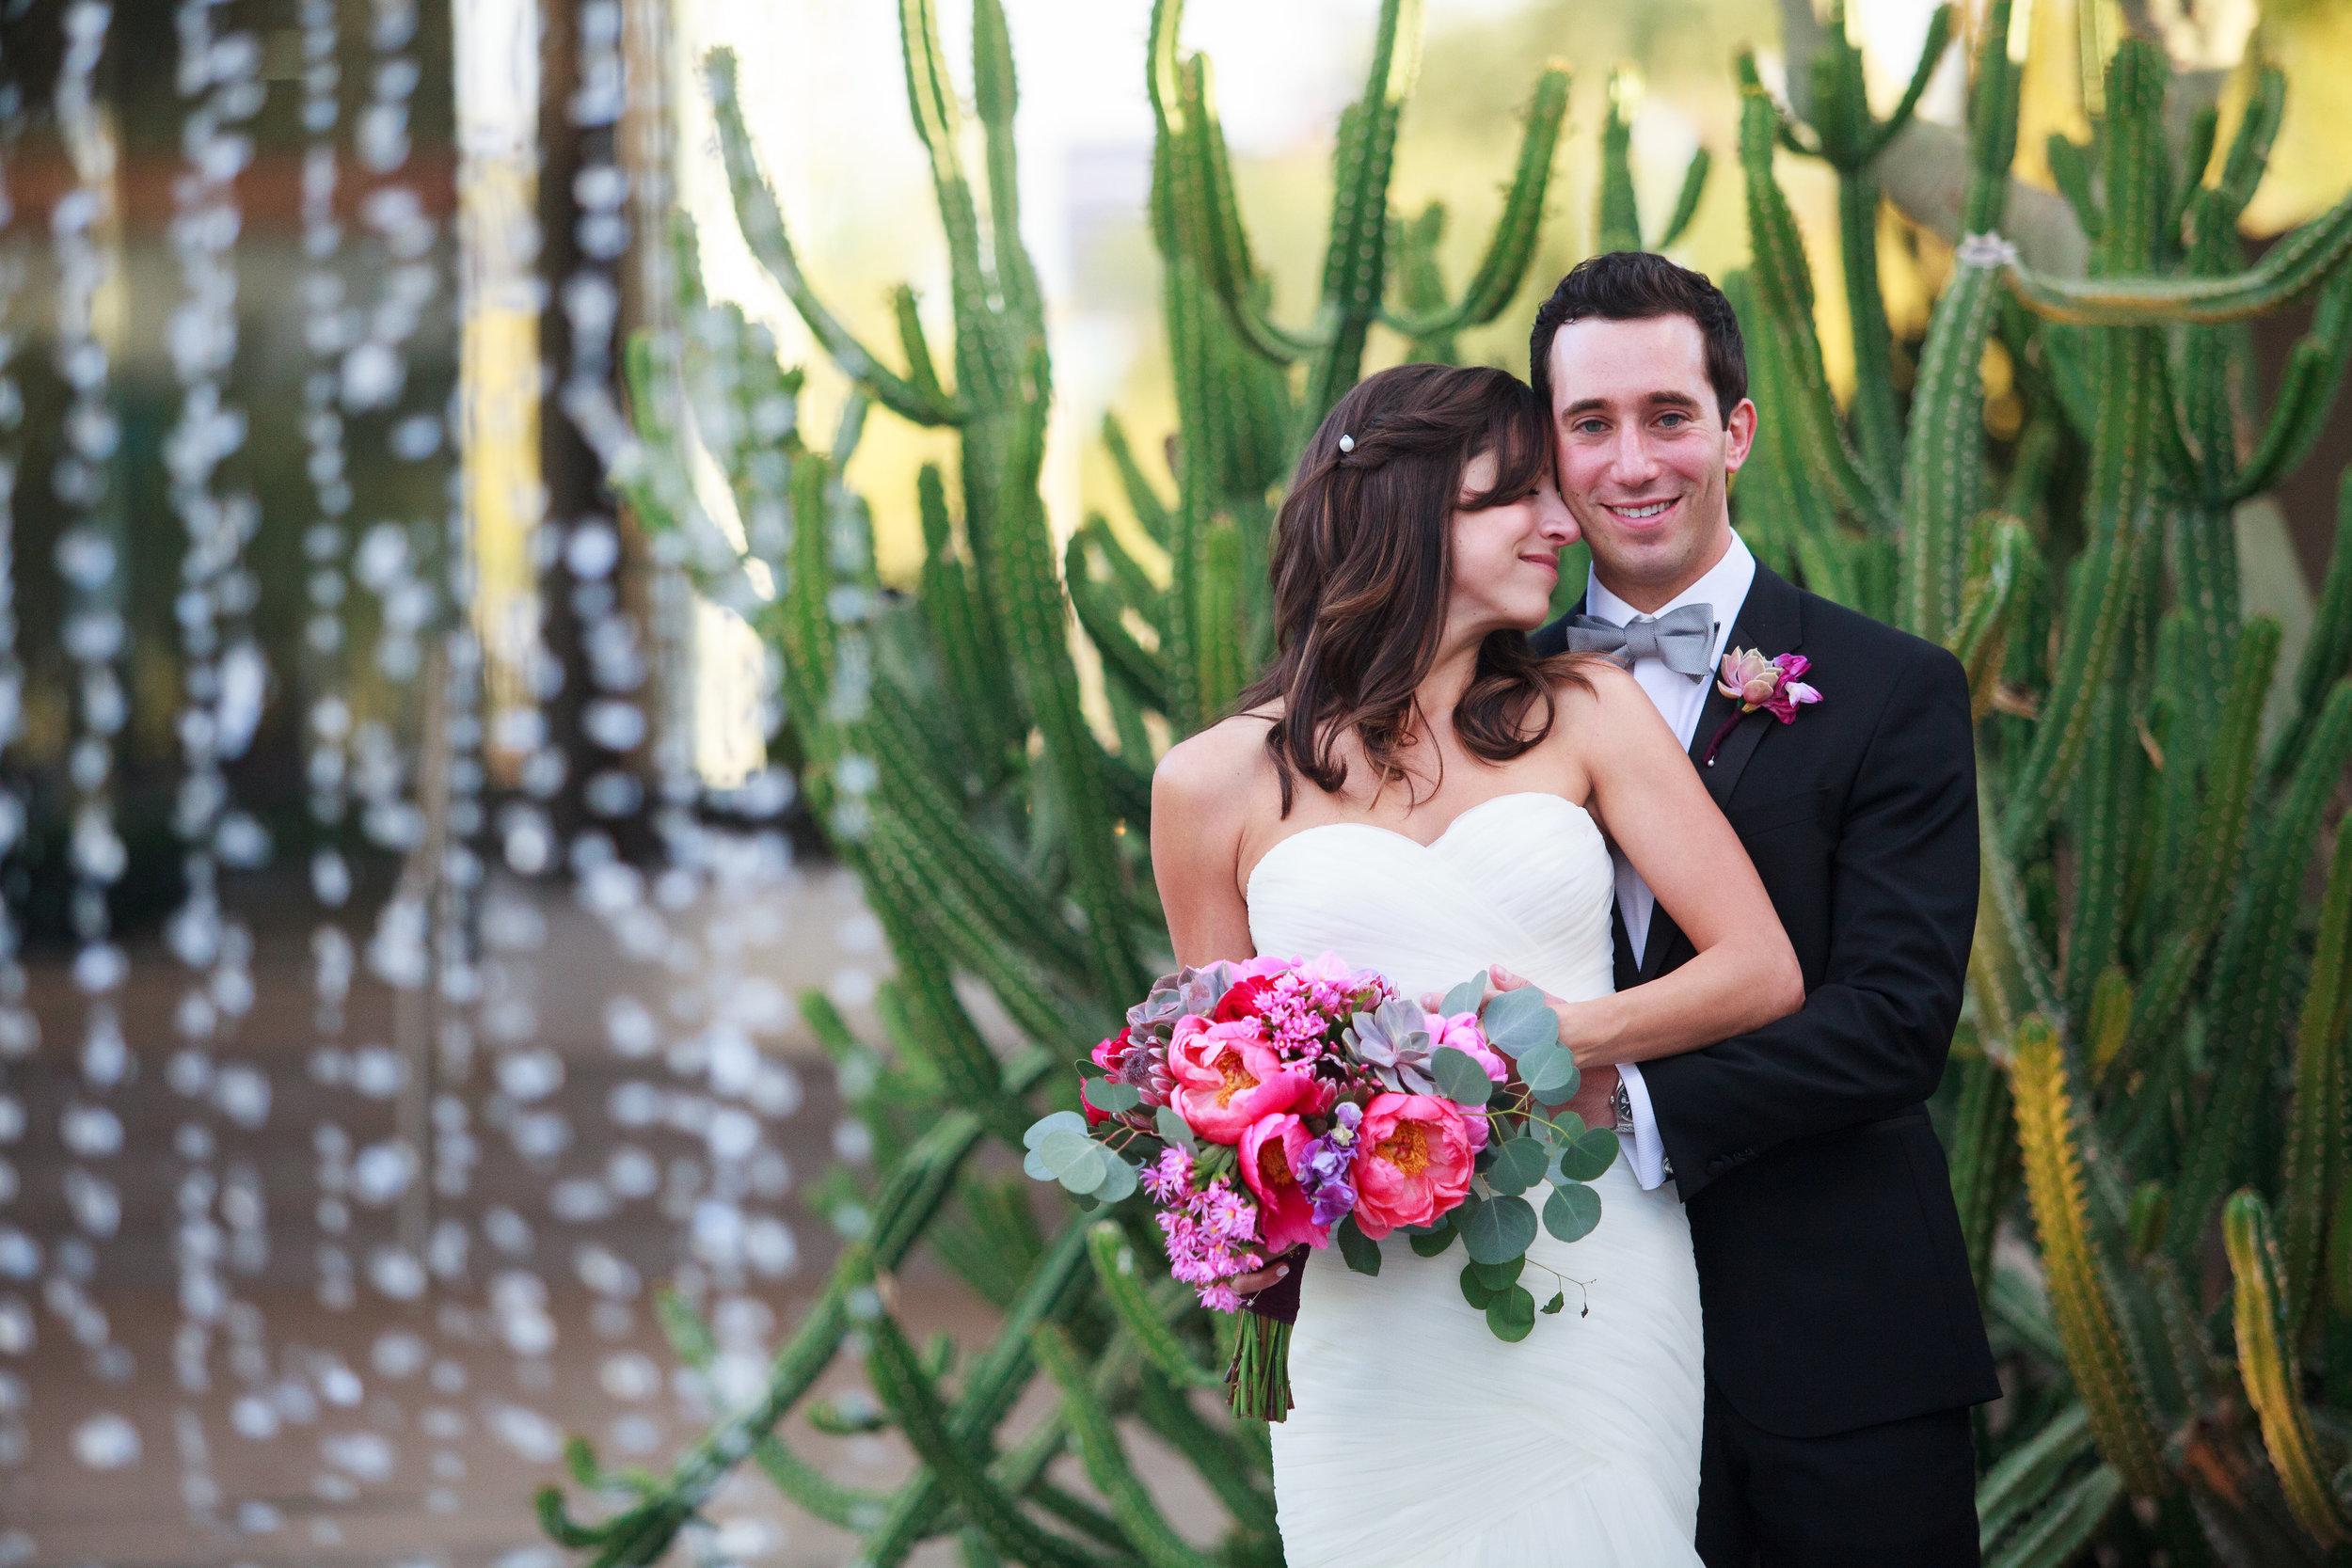 wedding, Arizona wedding, art museum wedding, wedding planner, wedding lighting, Phoenix-Scottsdale-Arizona-Wedding-Planner-Wedding-Venue-Destination-Wedding-Planner, bride, groom, peony, bouquet